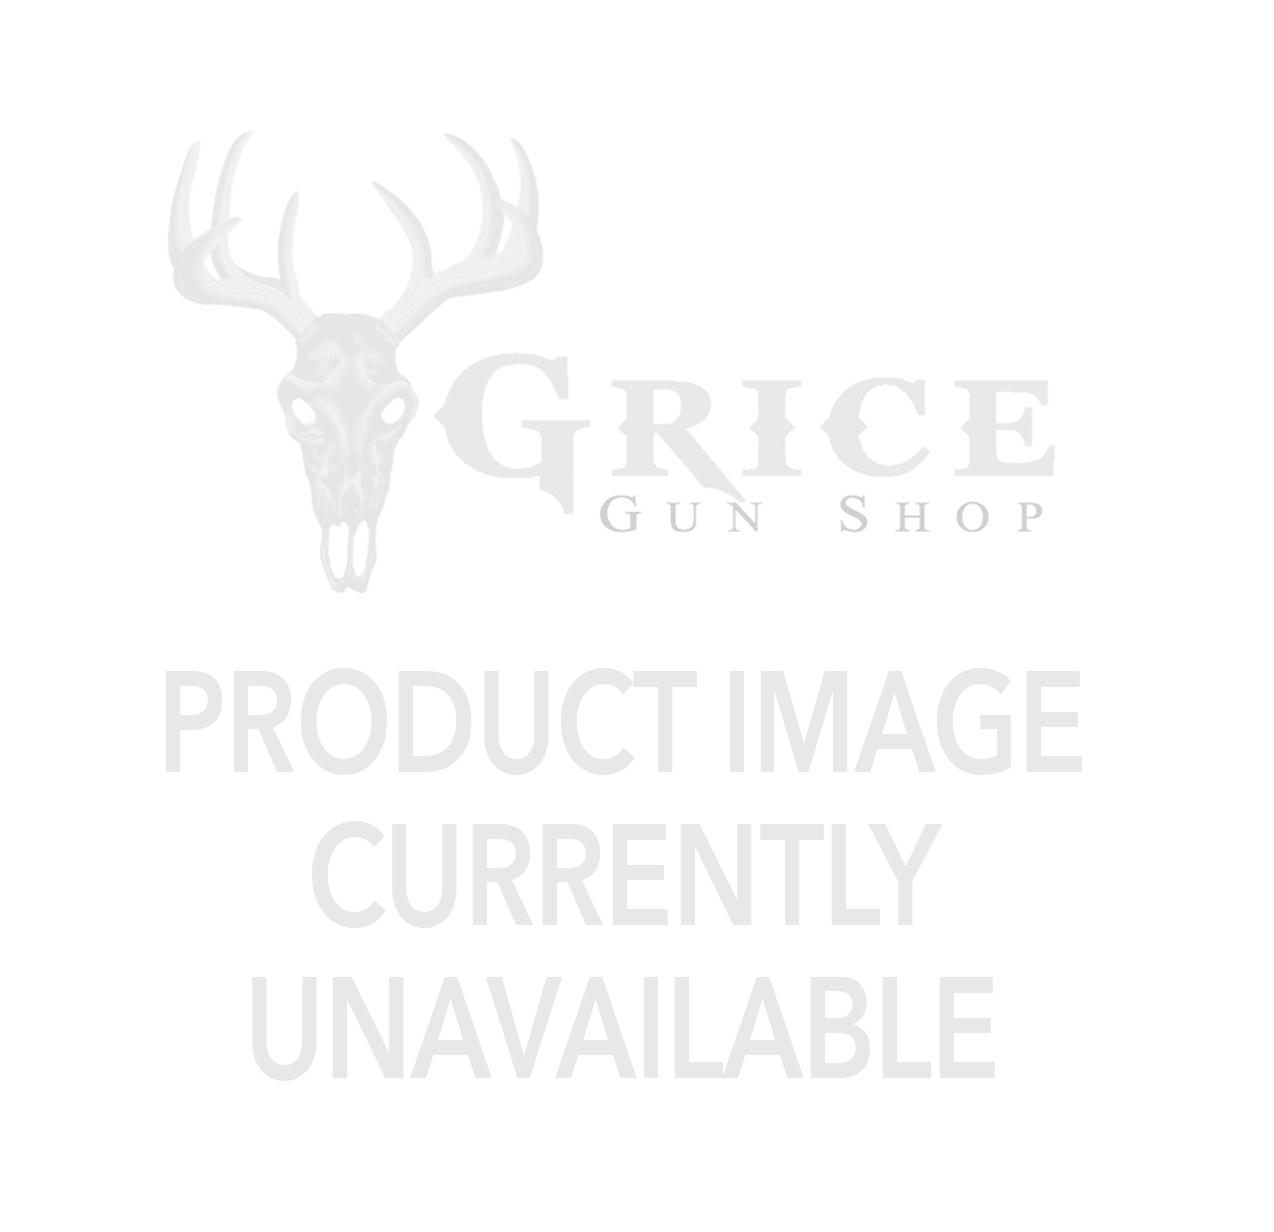 Simmons - ProHunter 4x32mm ProDiamond Reticle